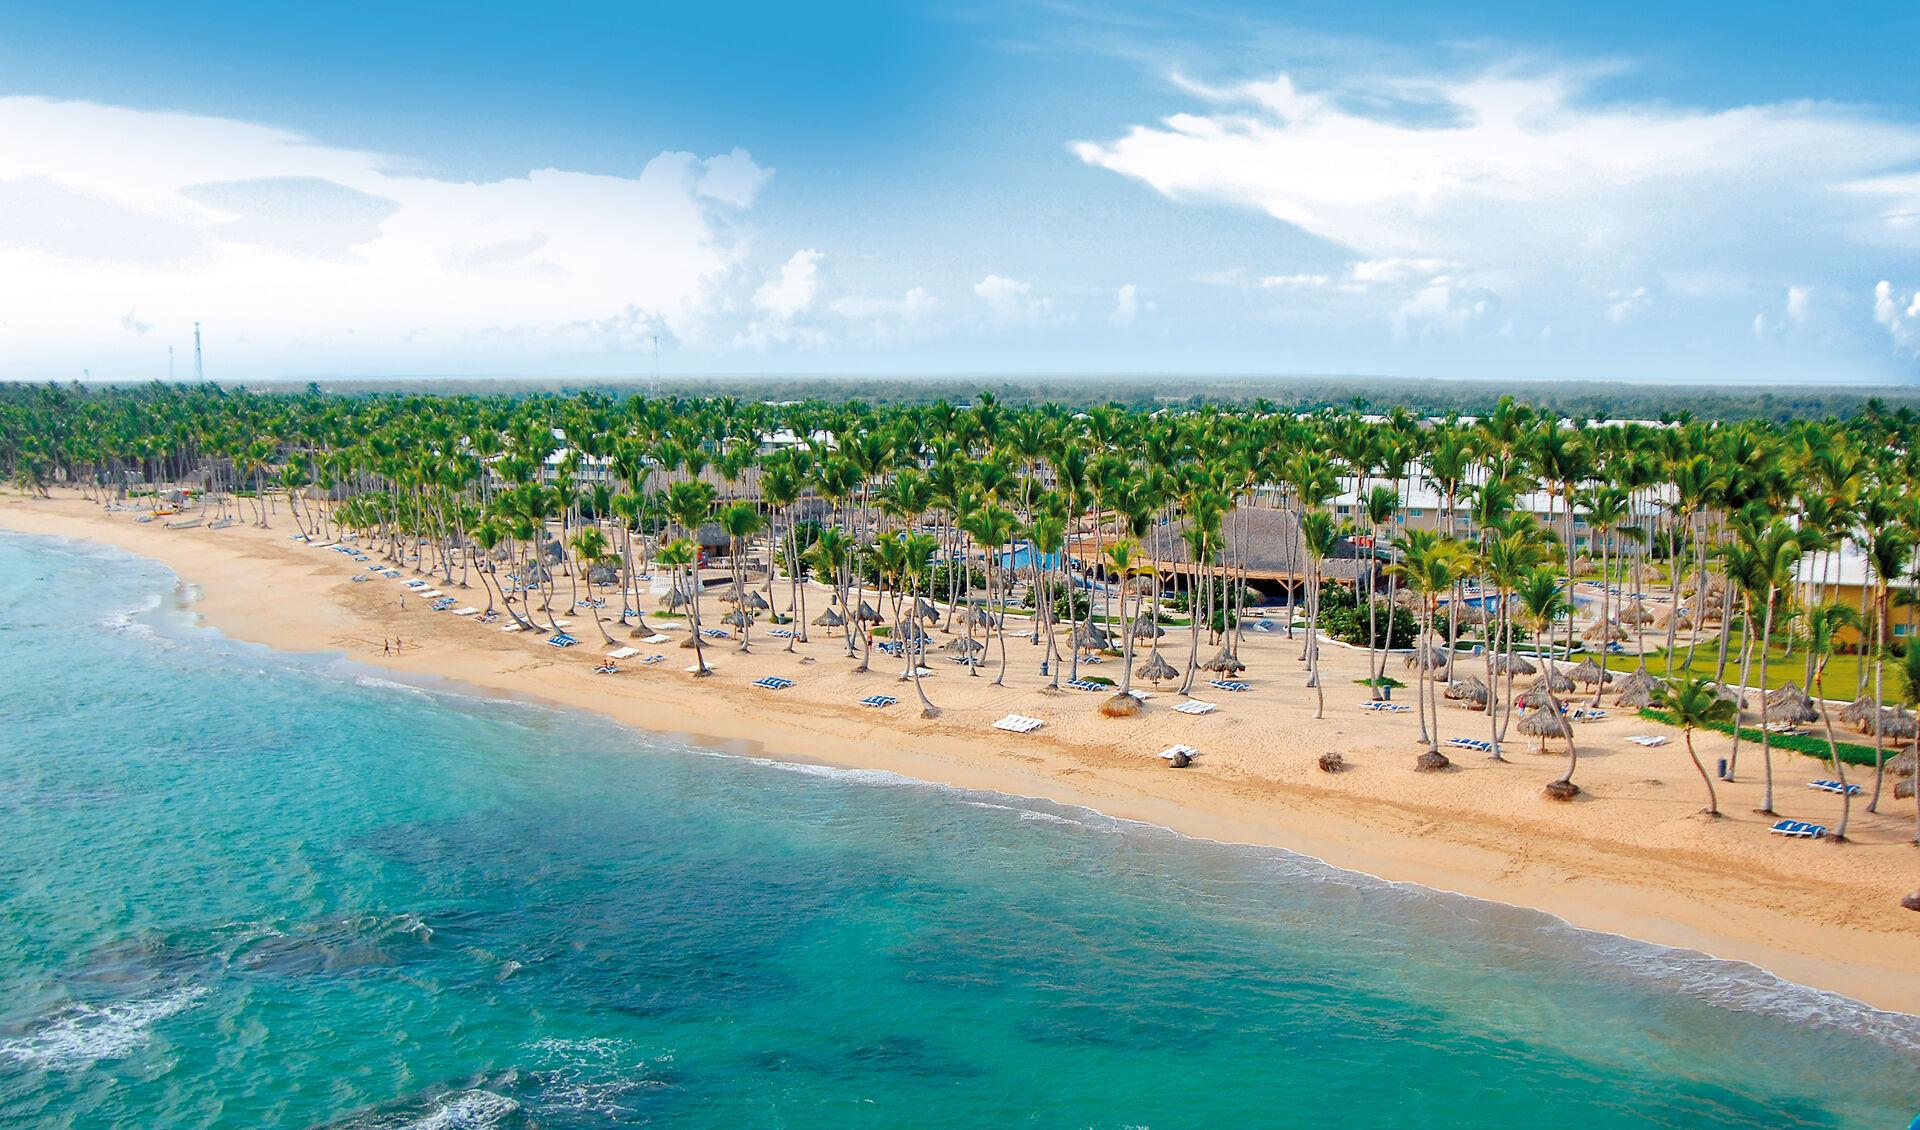 Séjour Caraïbes - Grand Sirenis Punta Cana Resort & Aquagames - 4*